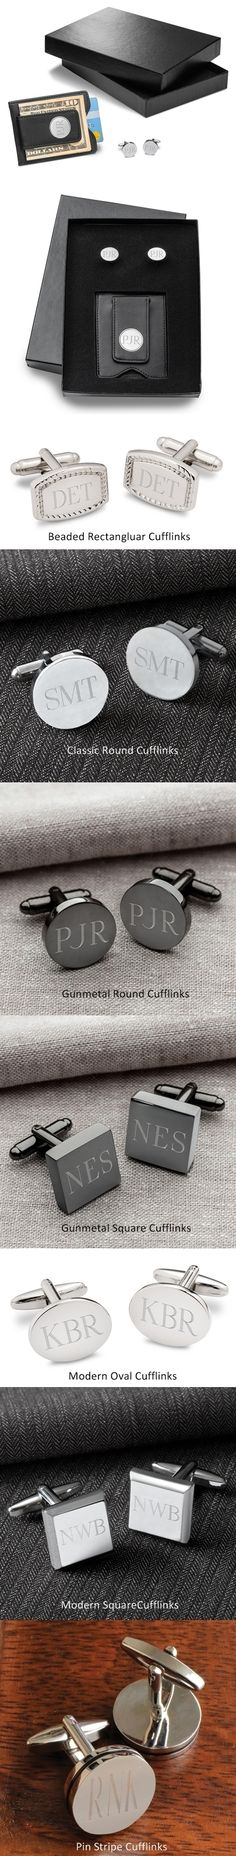 Personalized Black Leather Wallet & Cufflinks Set (7 Cufflink Styles)